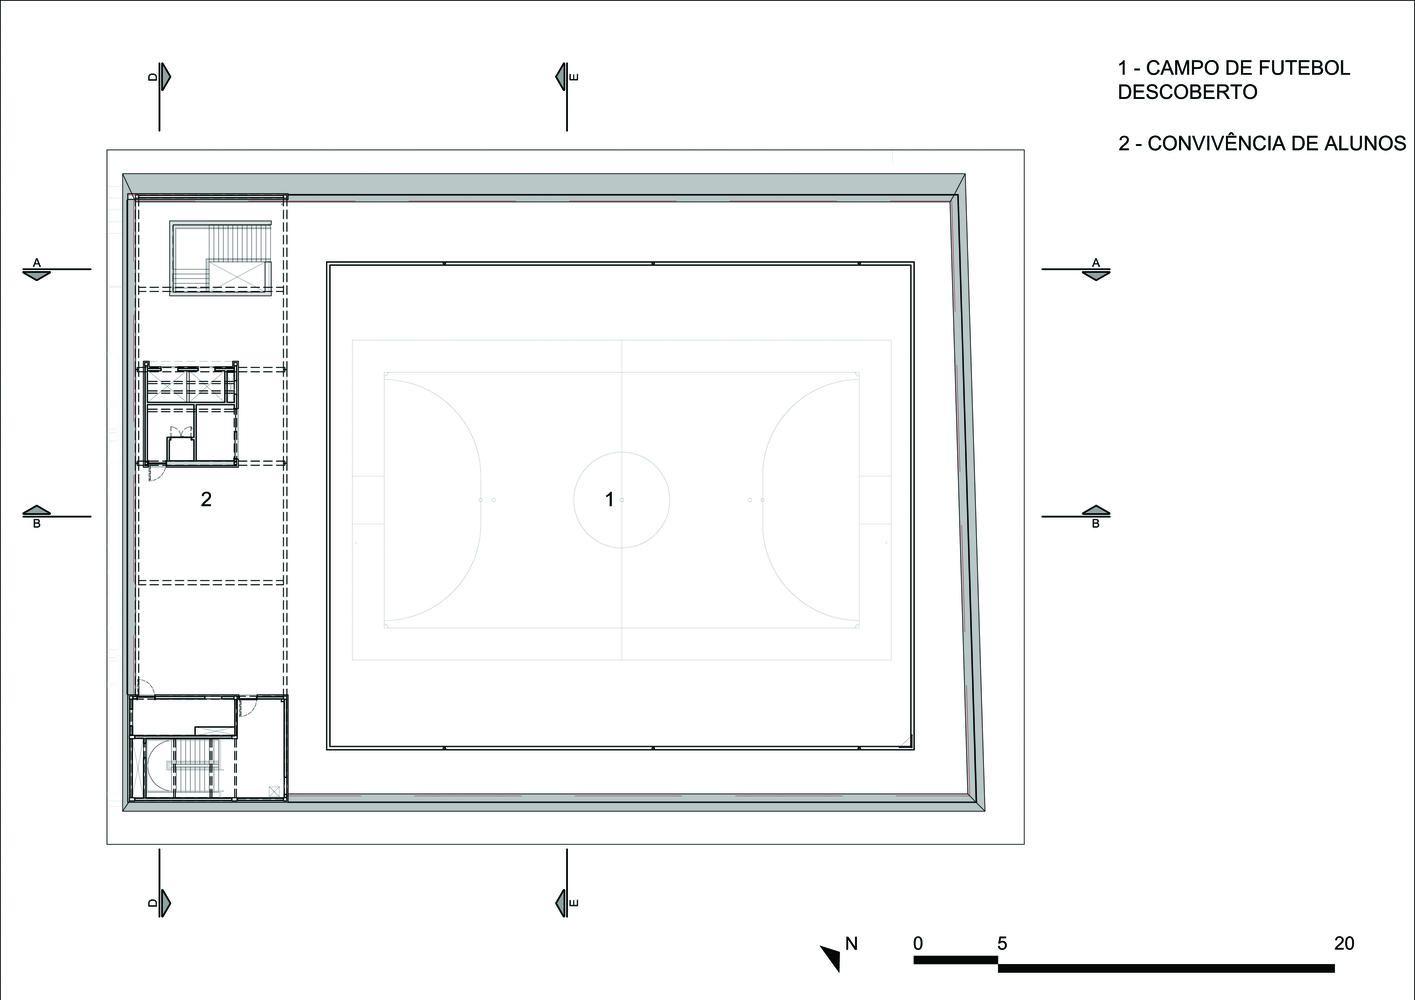 Galeria De Ginasio De Esportes Do Colegio Sao Luis Urdi Arquitetura 42 Sao Luis Sports Art Sao